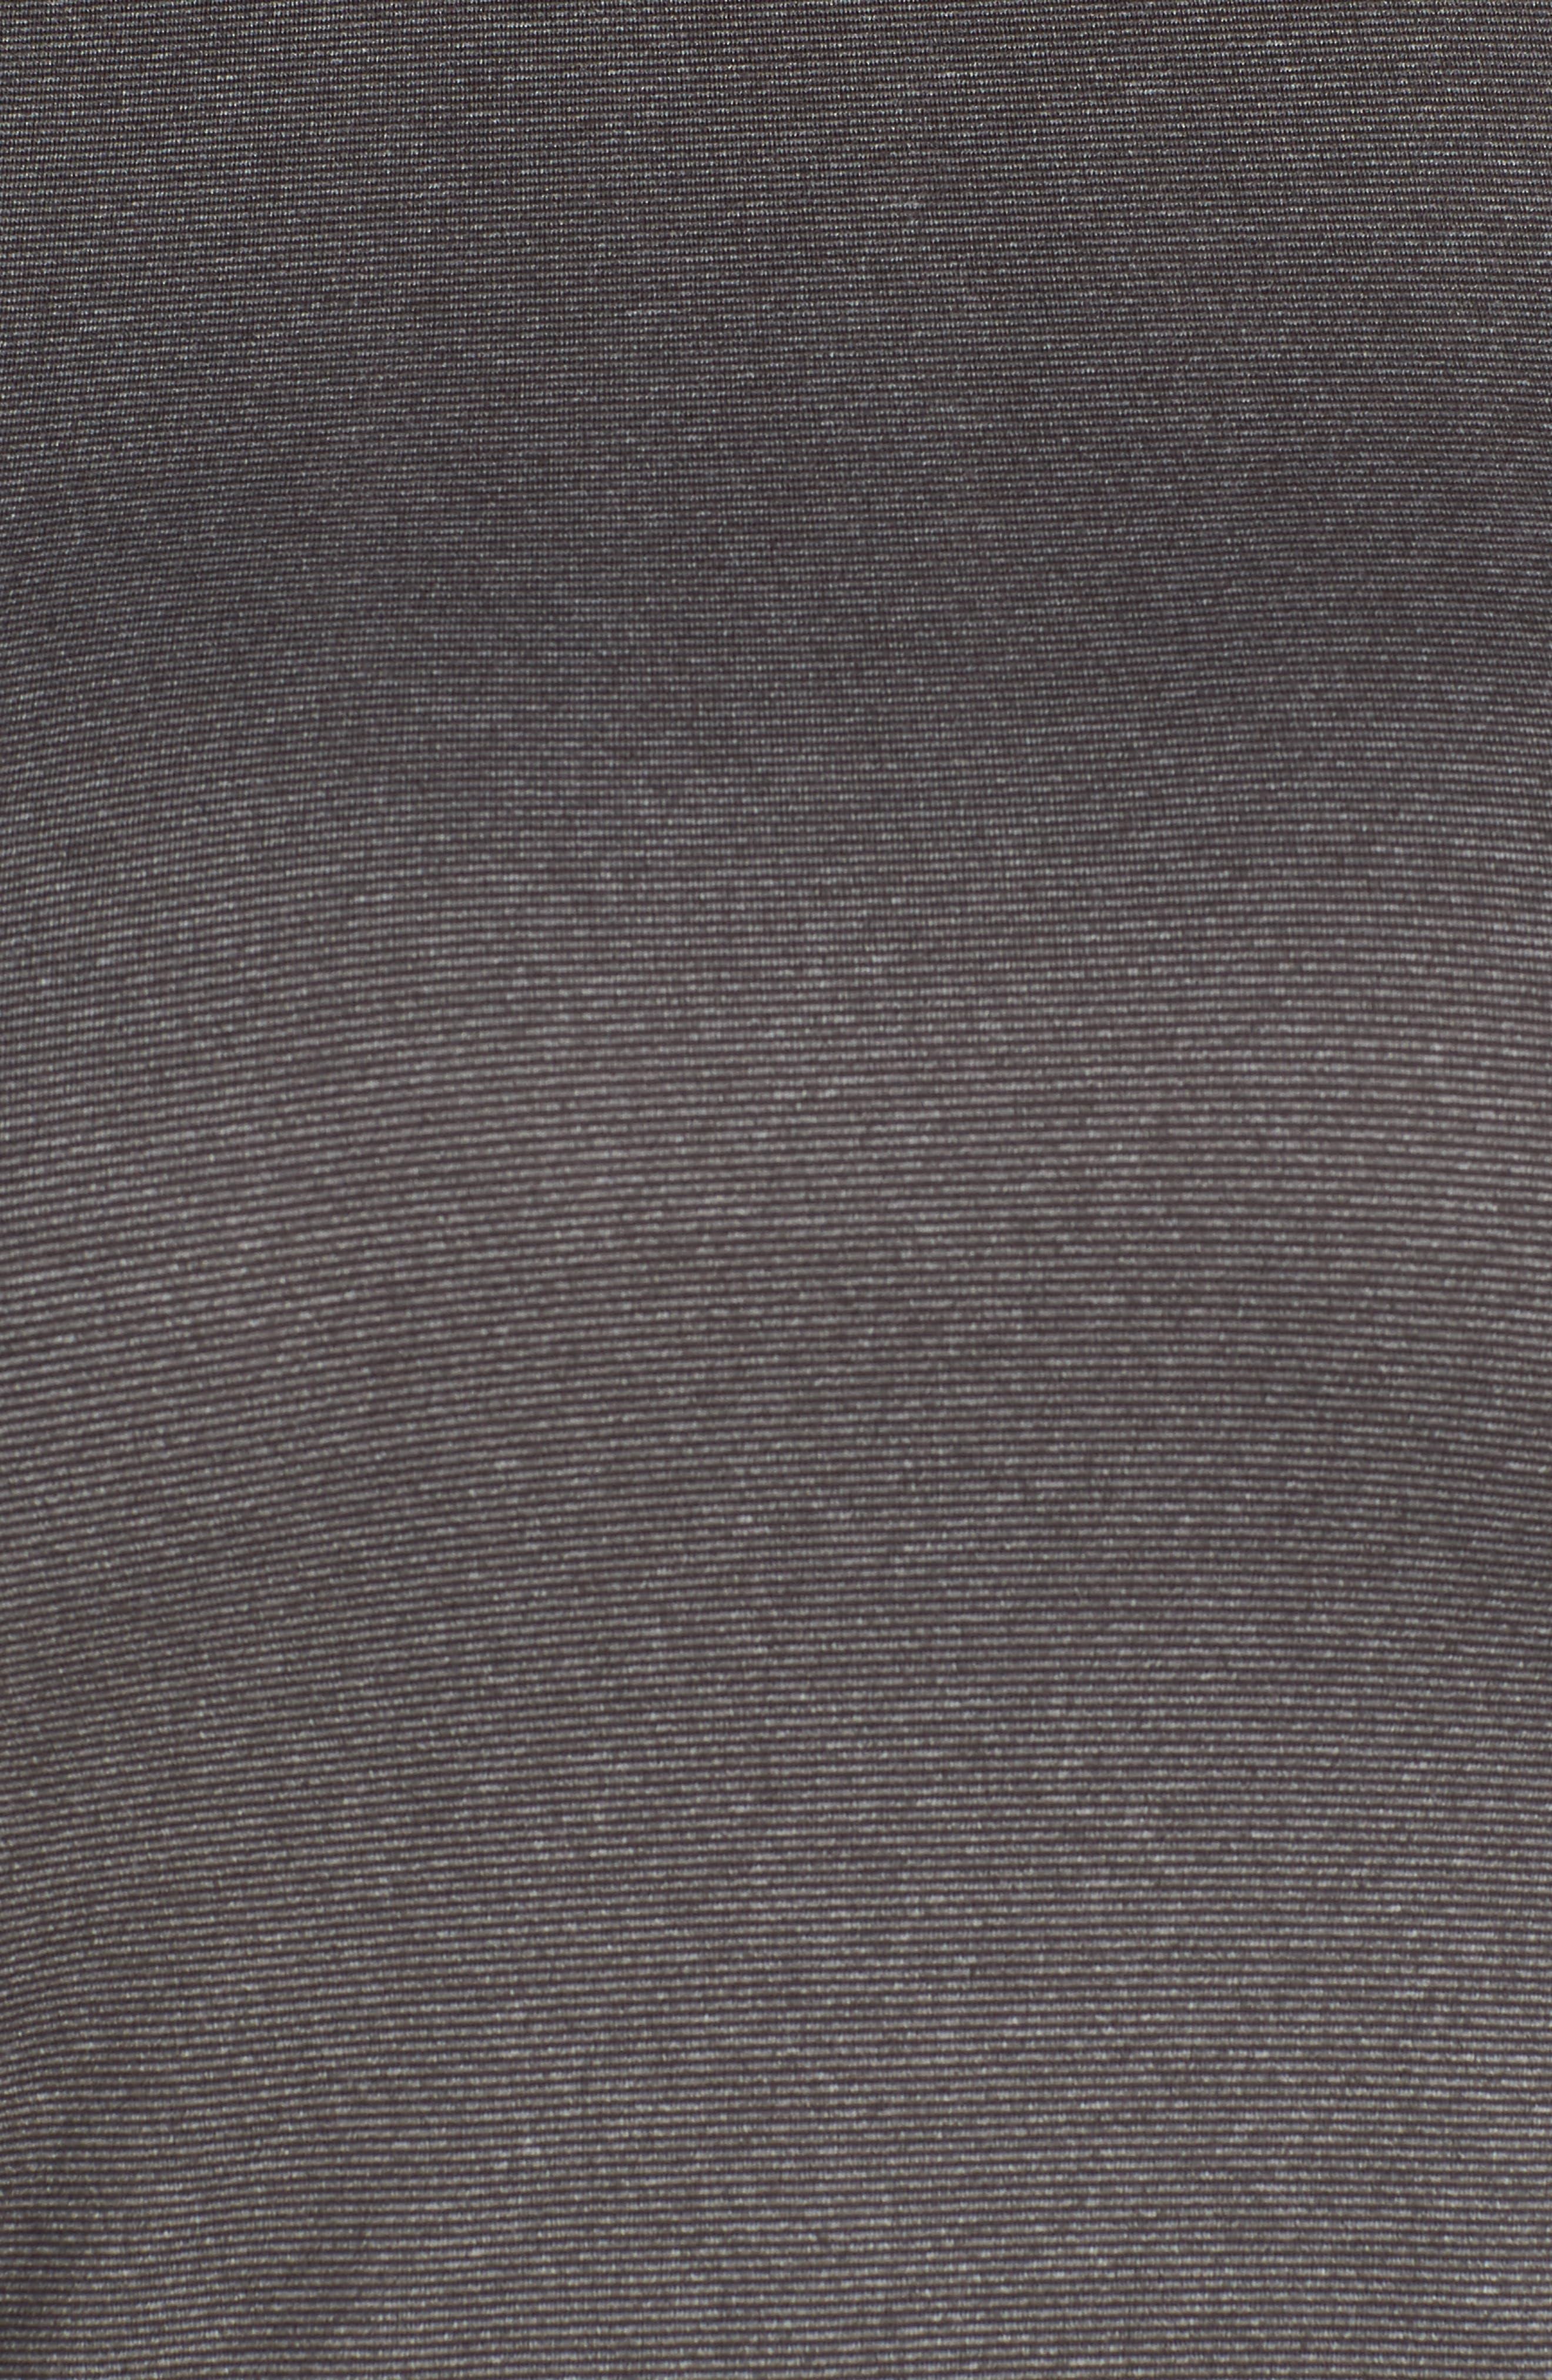 Hazy Day Tee,                             Alternate thumbnail 5, color,                             Grey Graphite